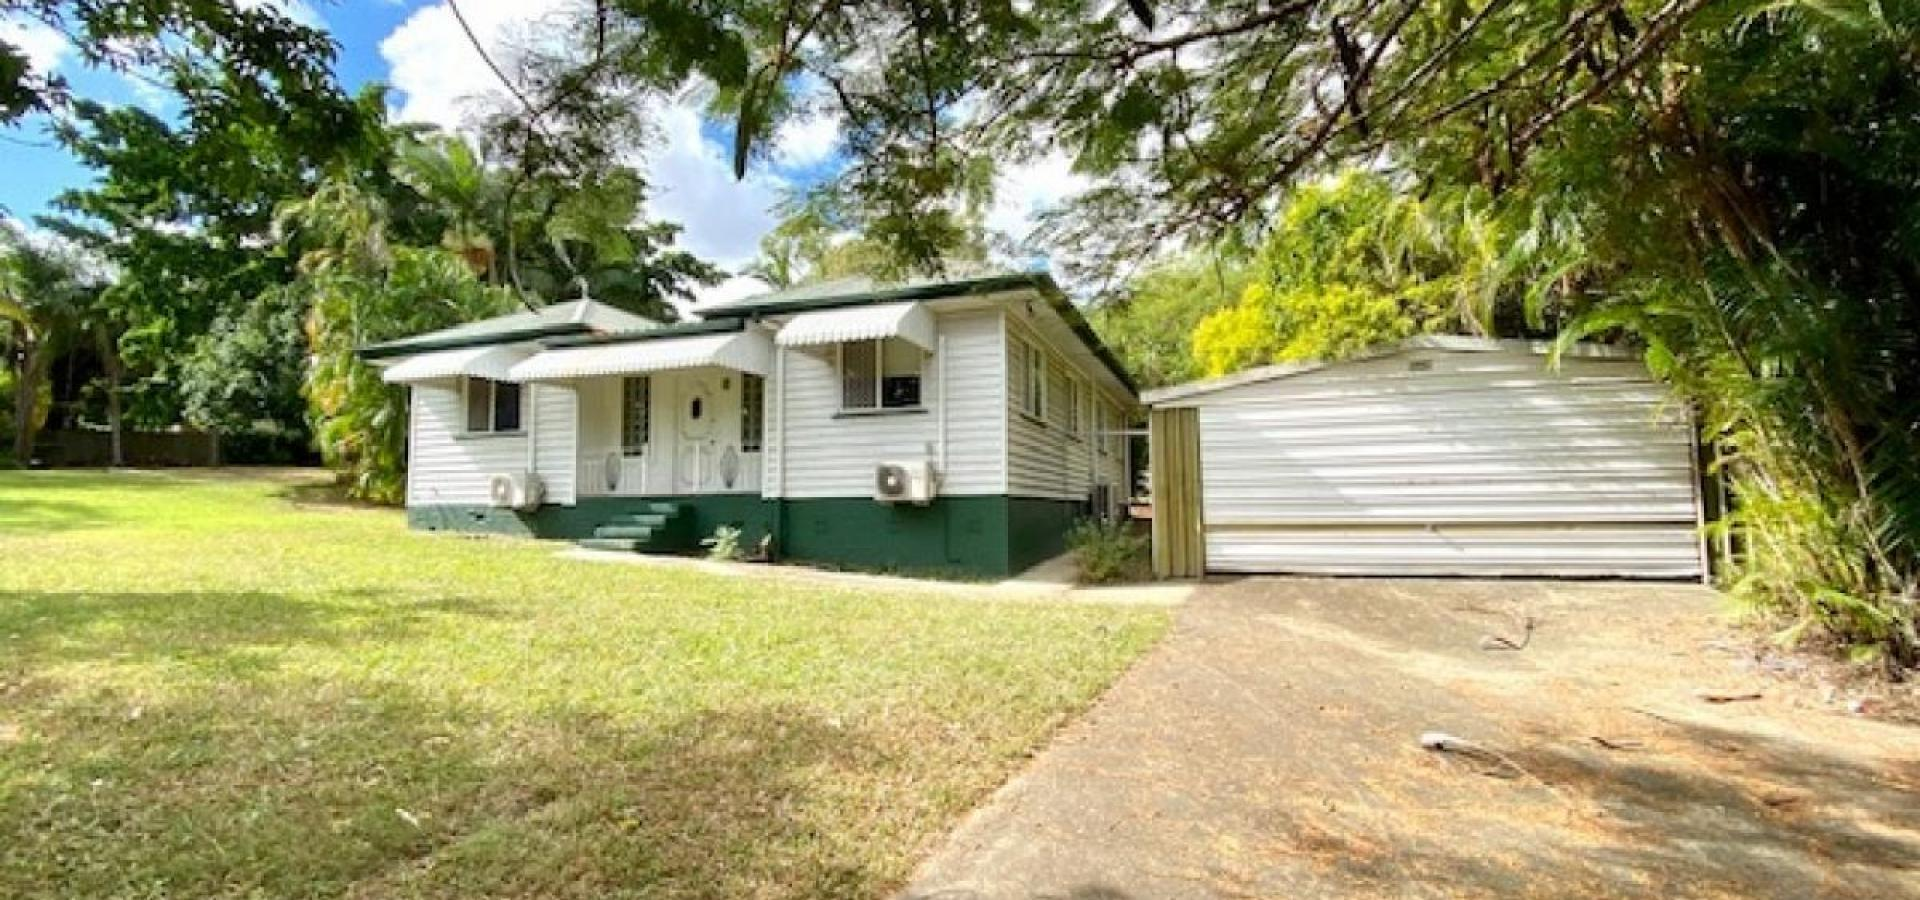 Mini acreage, 4 bedroom post war home, separate studio, pool and massive shed